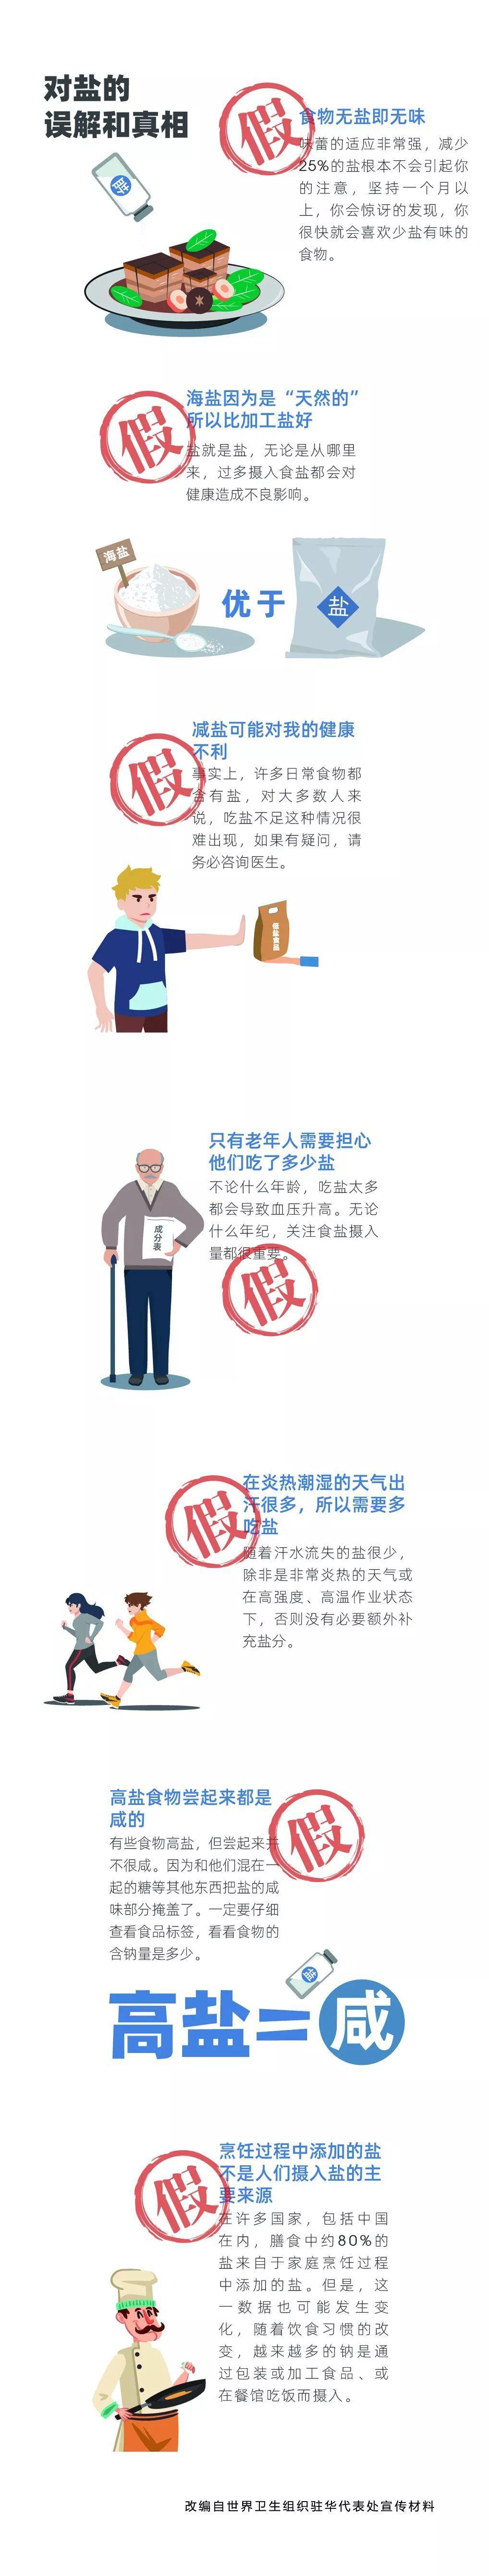 "5g时代,如何为健康""带盐北京助孕""?"